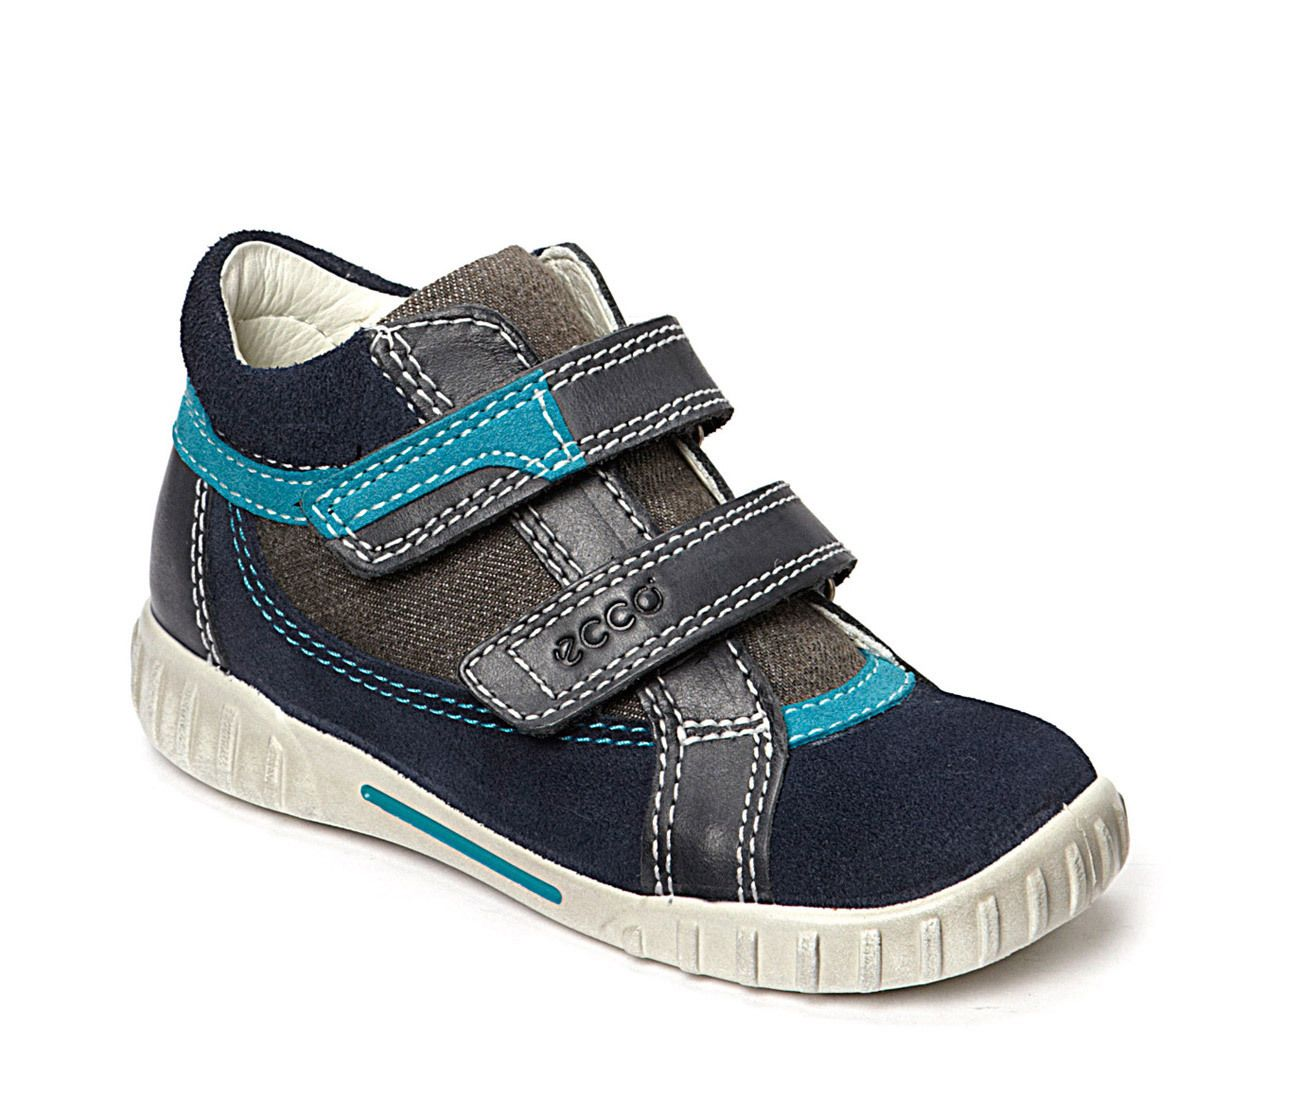 A really good shoe